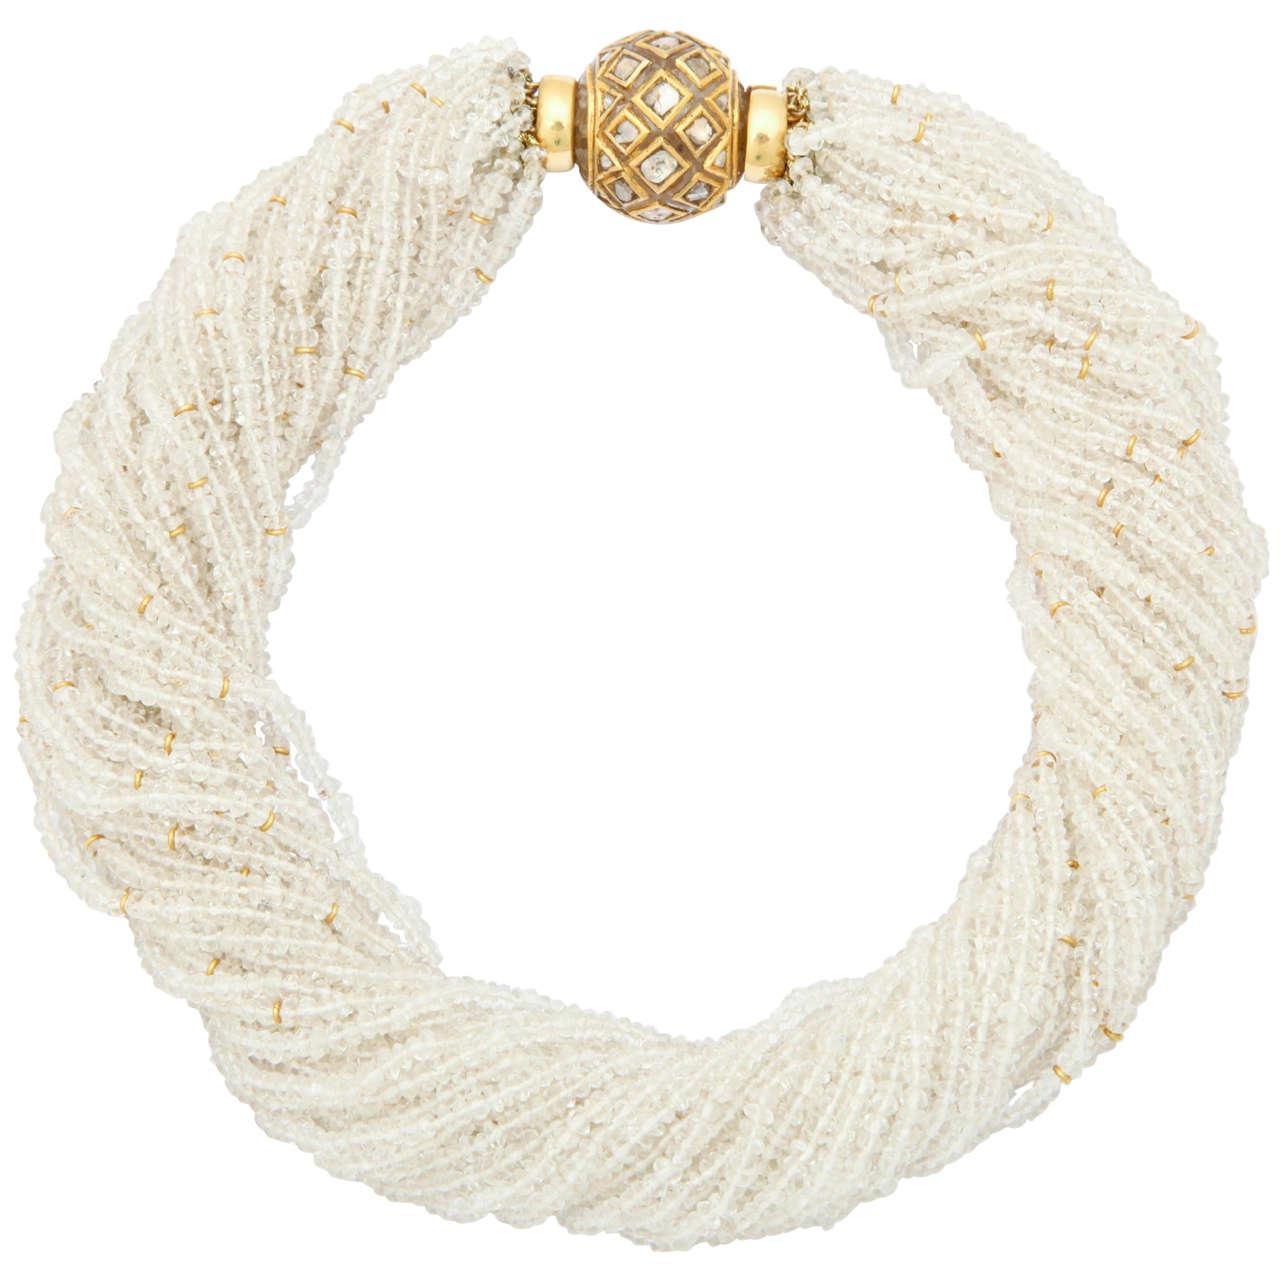 Diamond Inlaid Crystal Ball and Crystal Bead Necklace